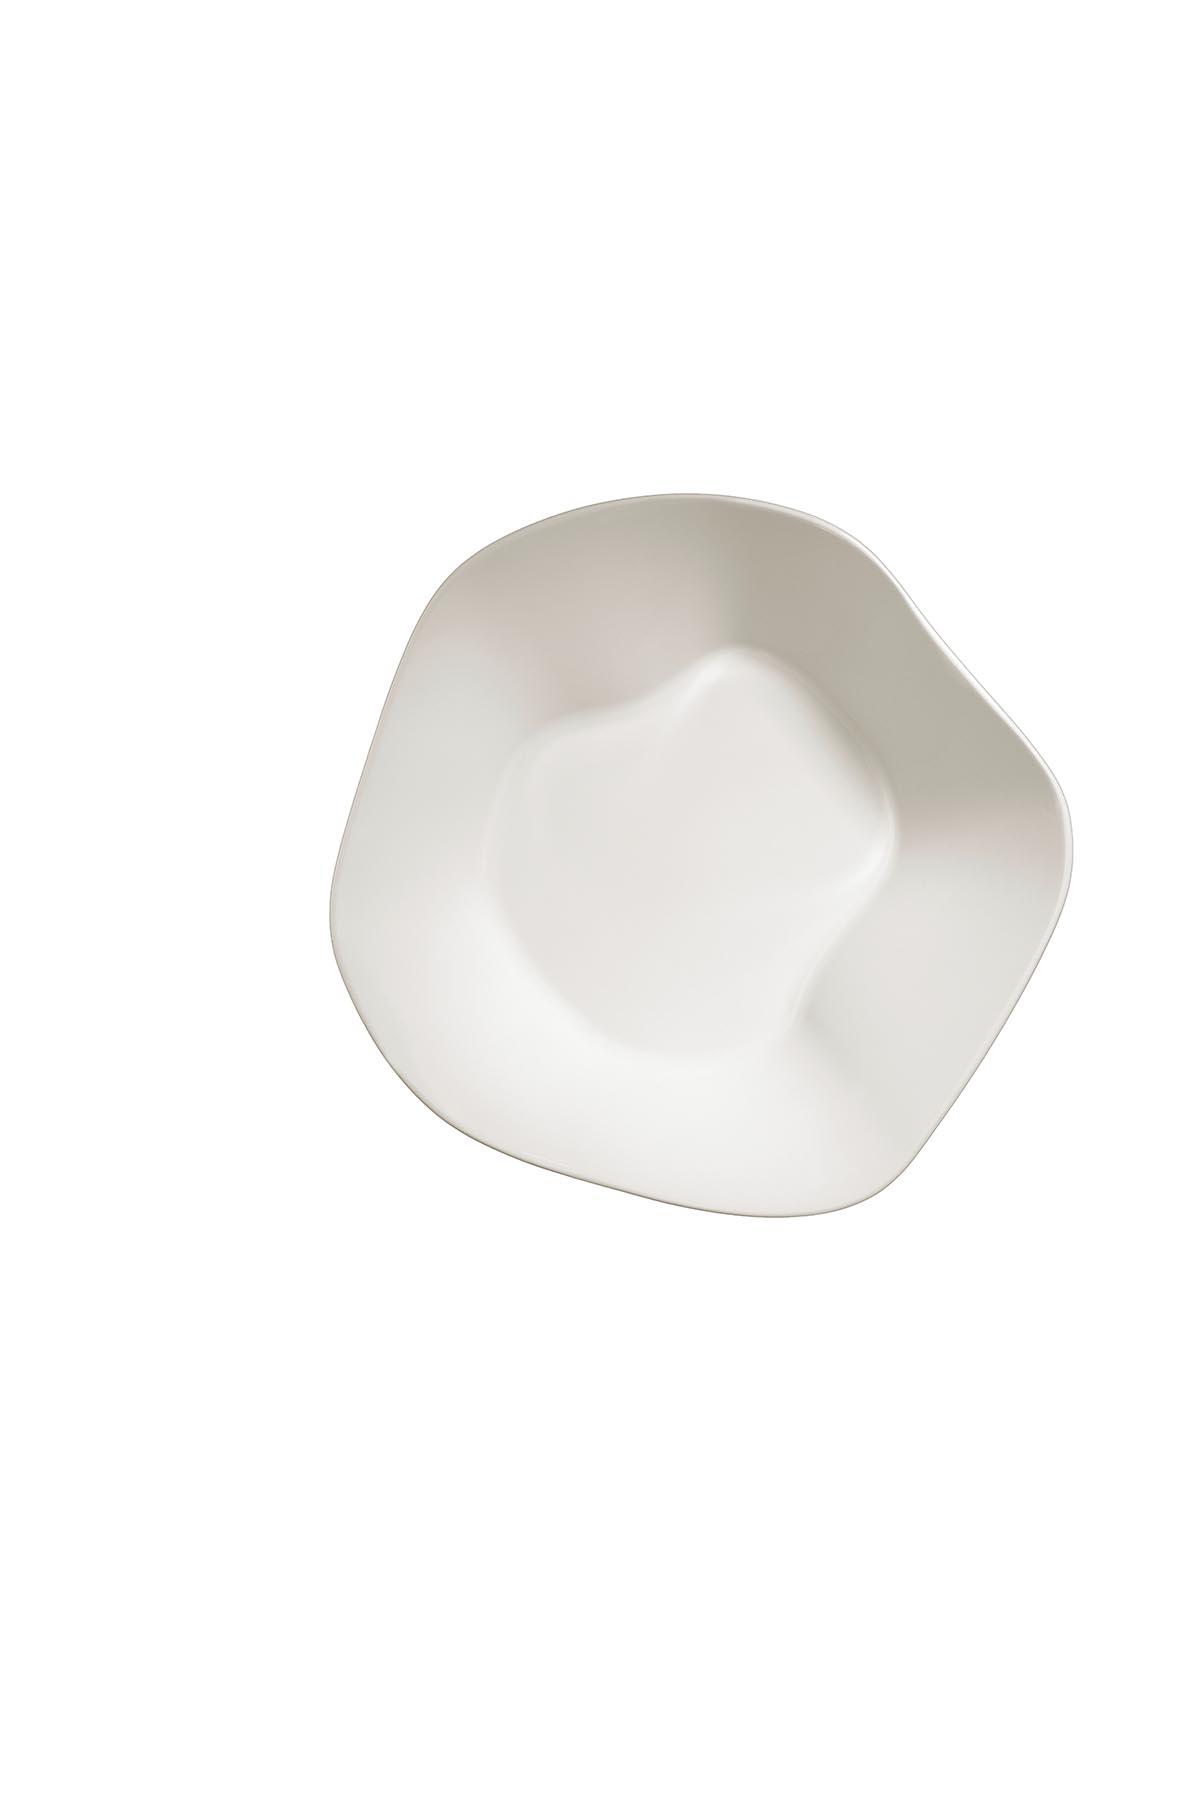 Kütahya Porselen Skallop 2'li 18 cm Kase Seti Krem